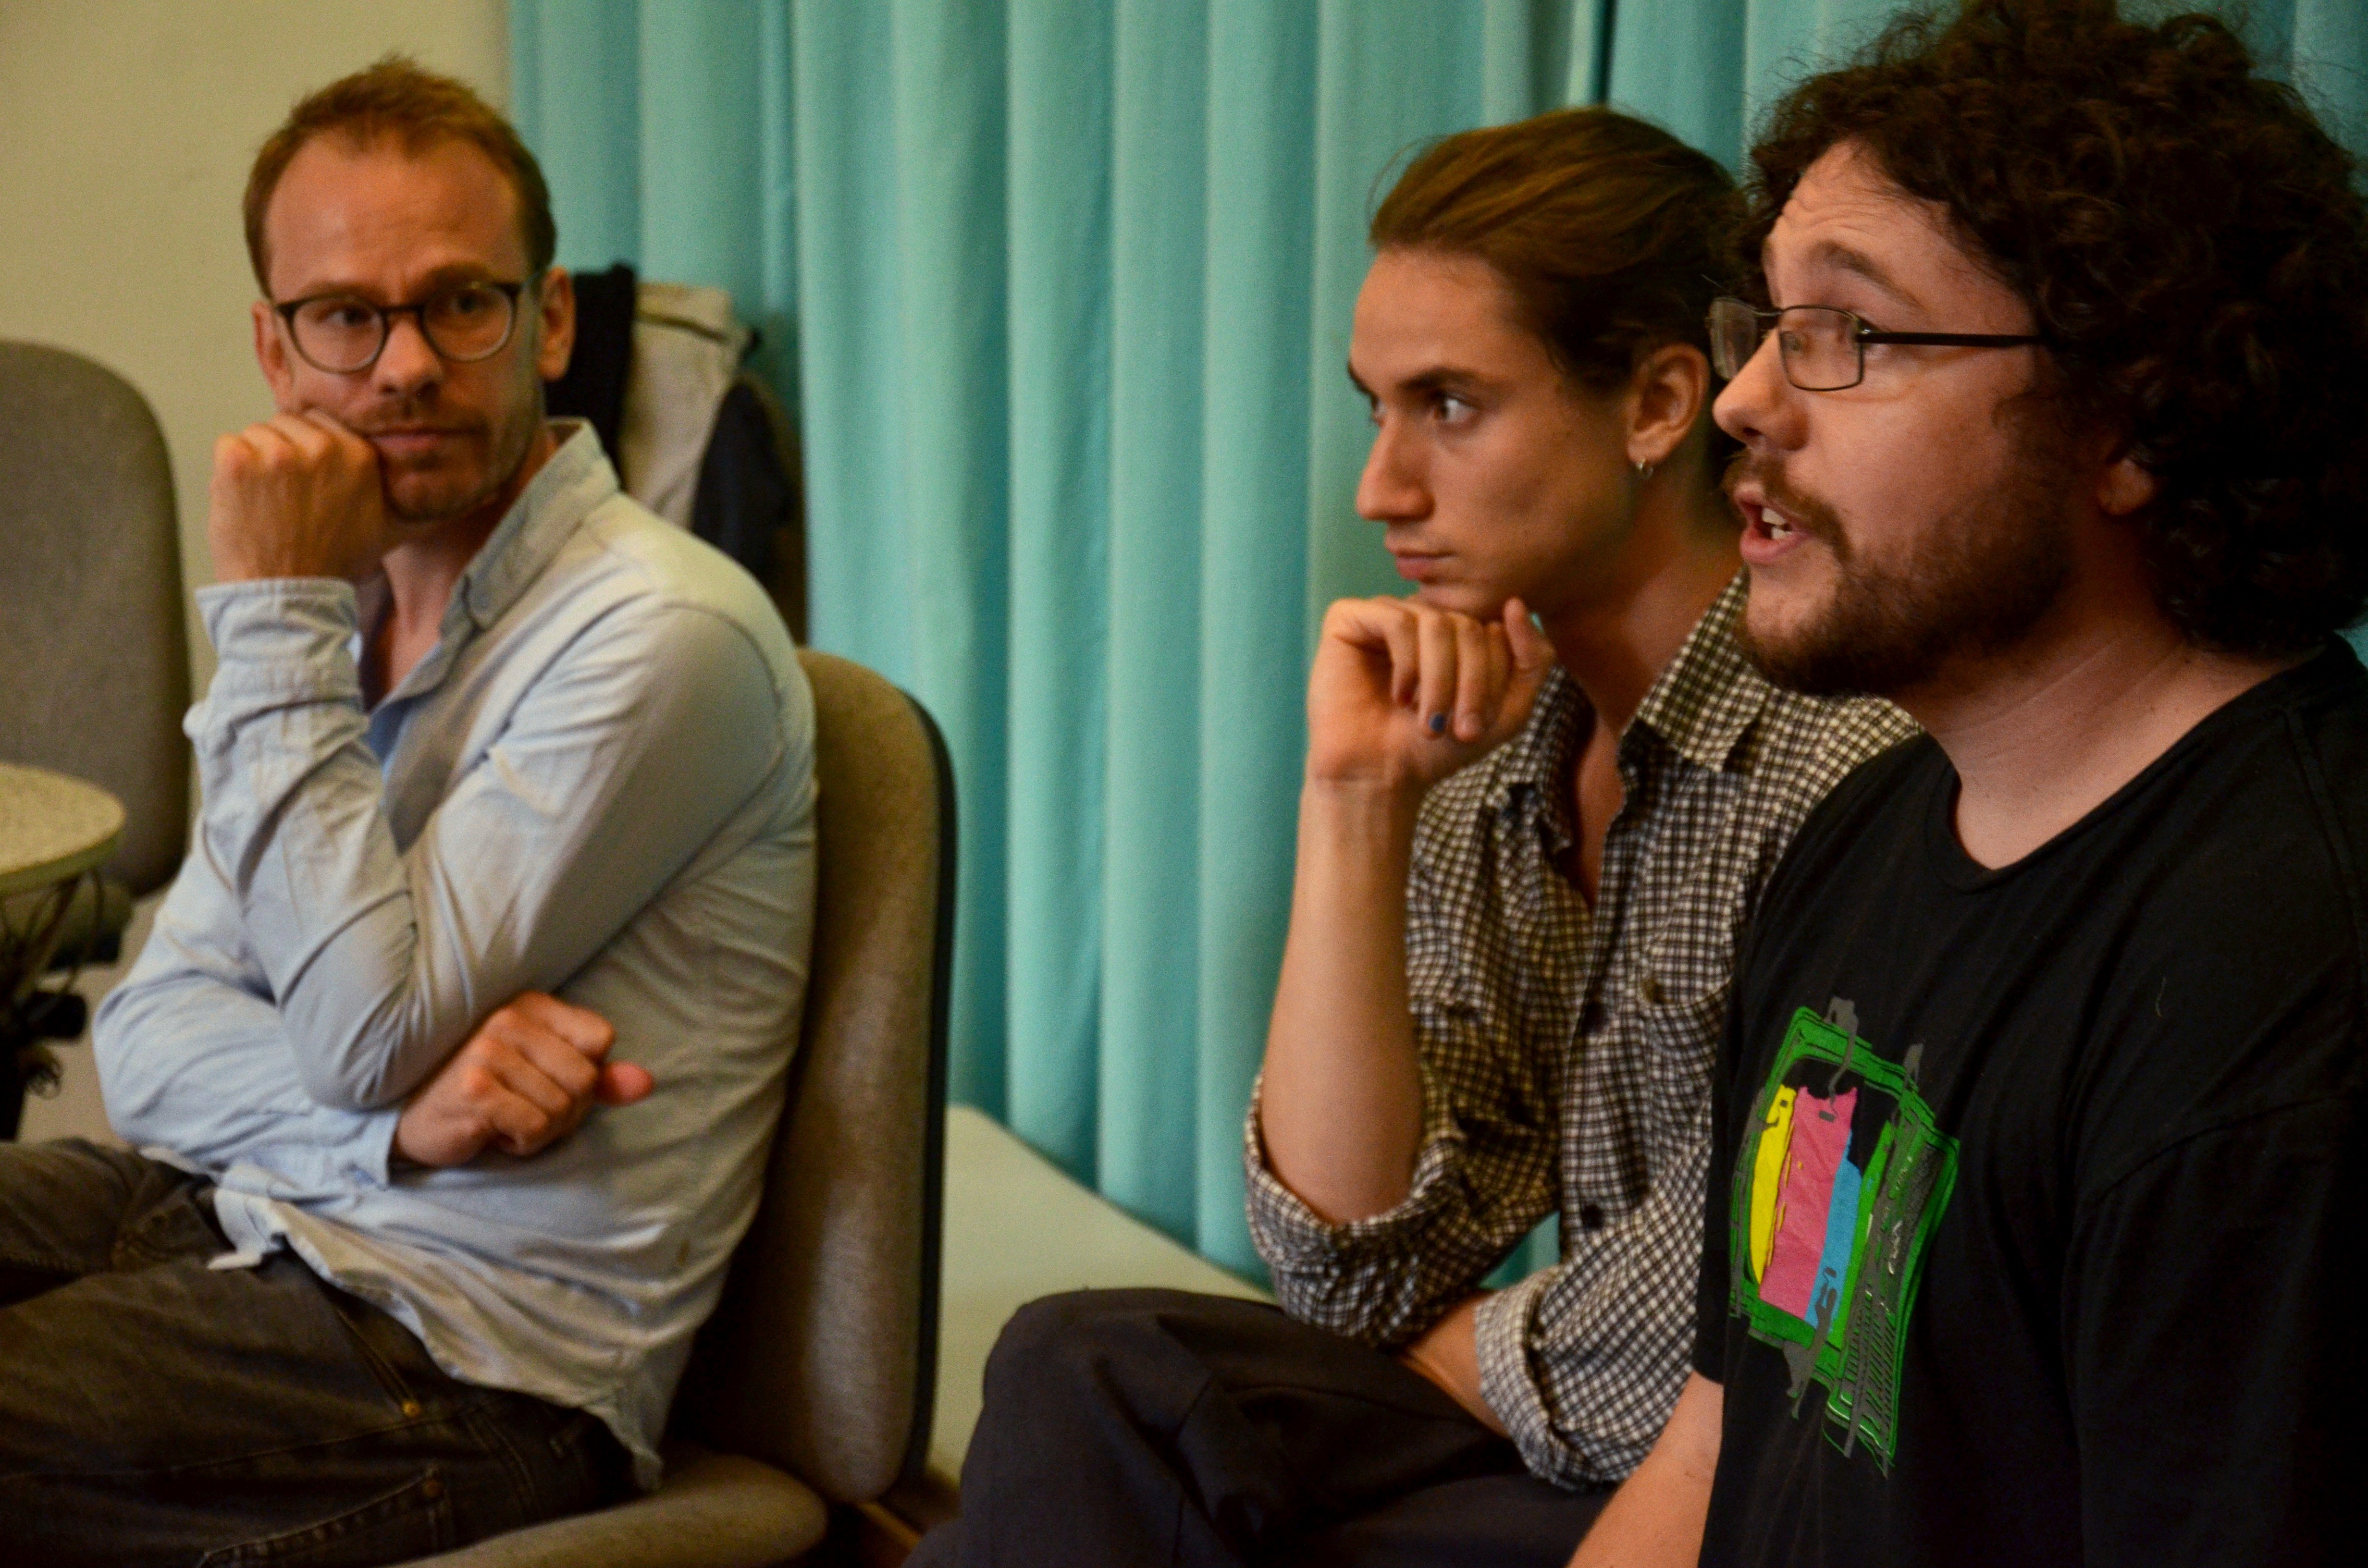 Lecture by Merijn Oudenampsen, photo by Whitney Stark (September 2016)